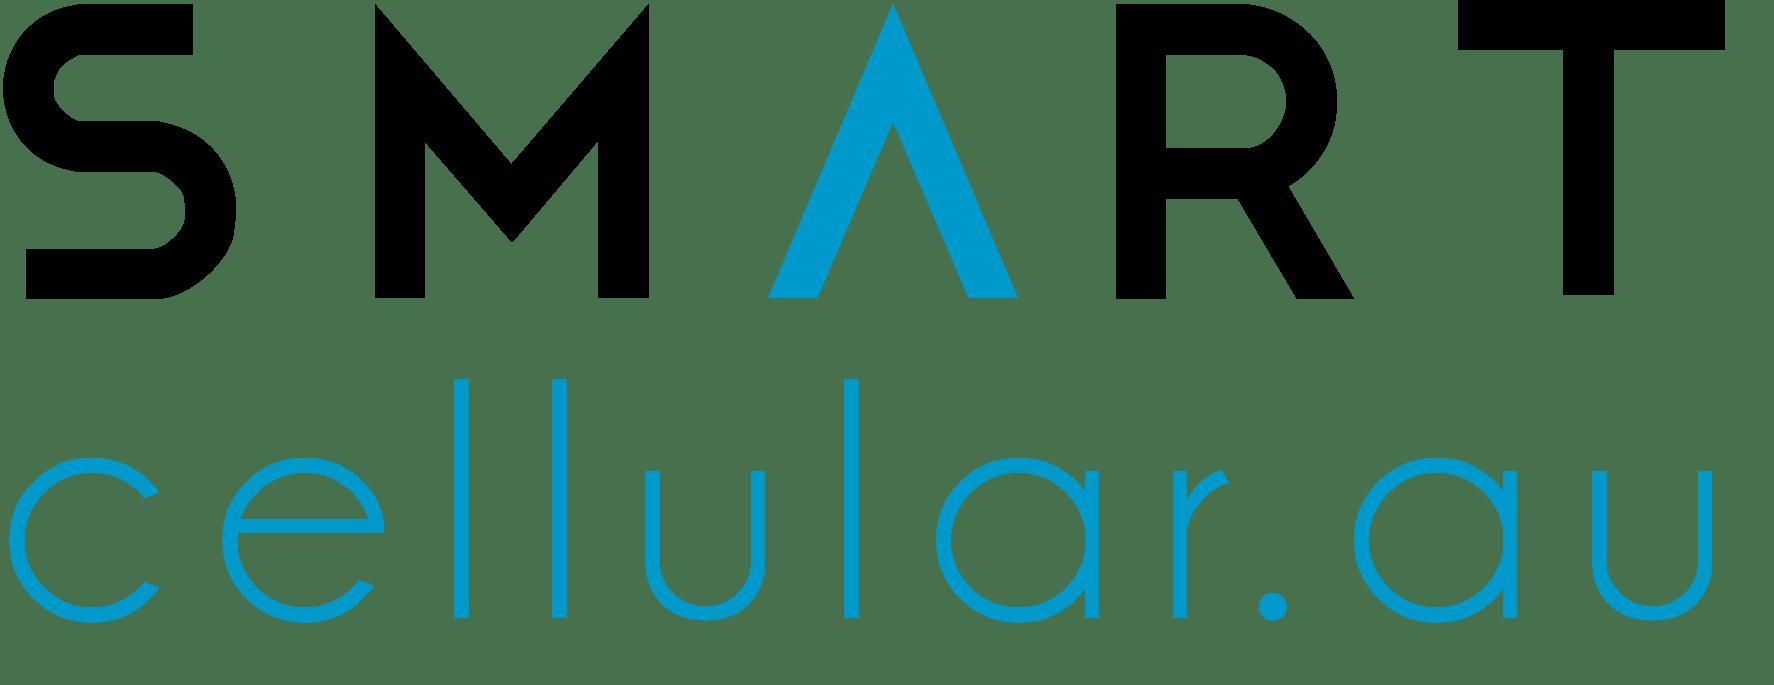 smartcellular.com.au